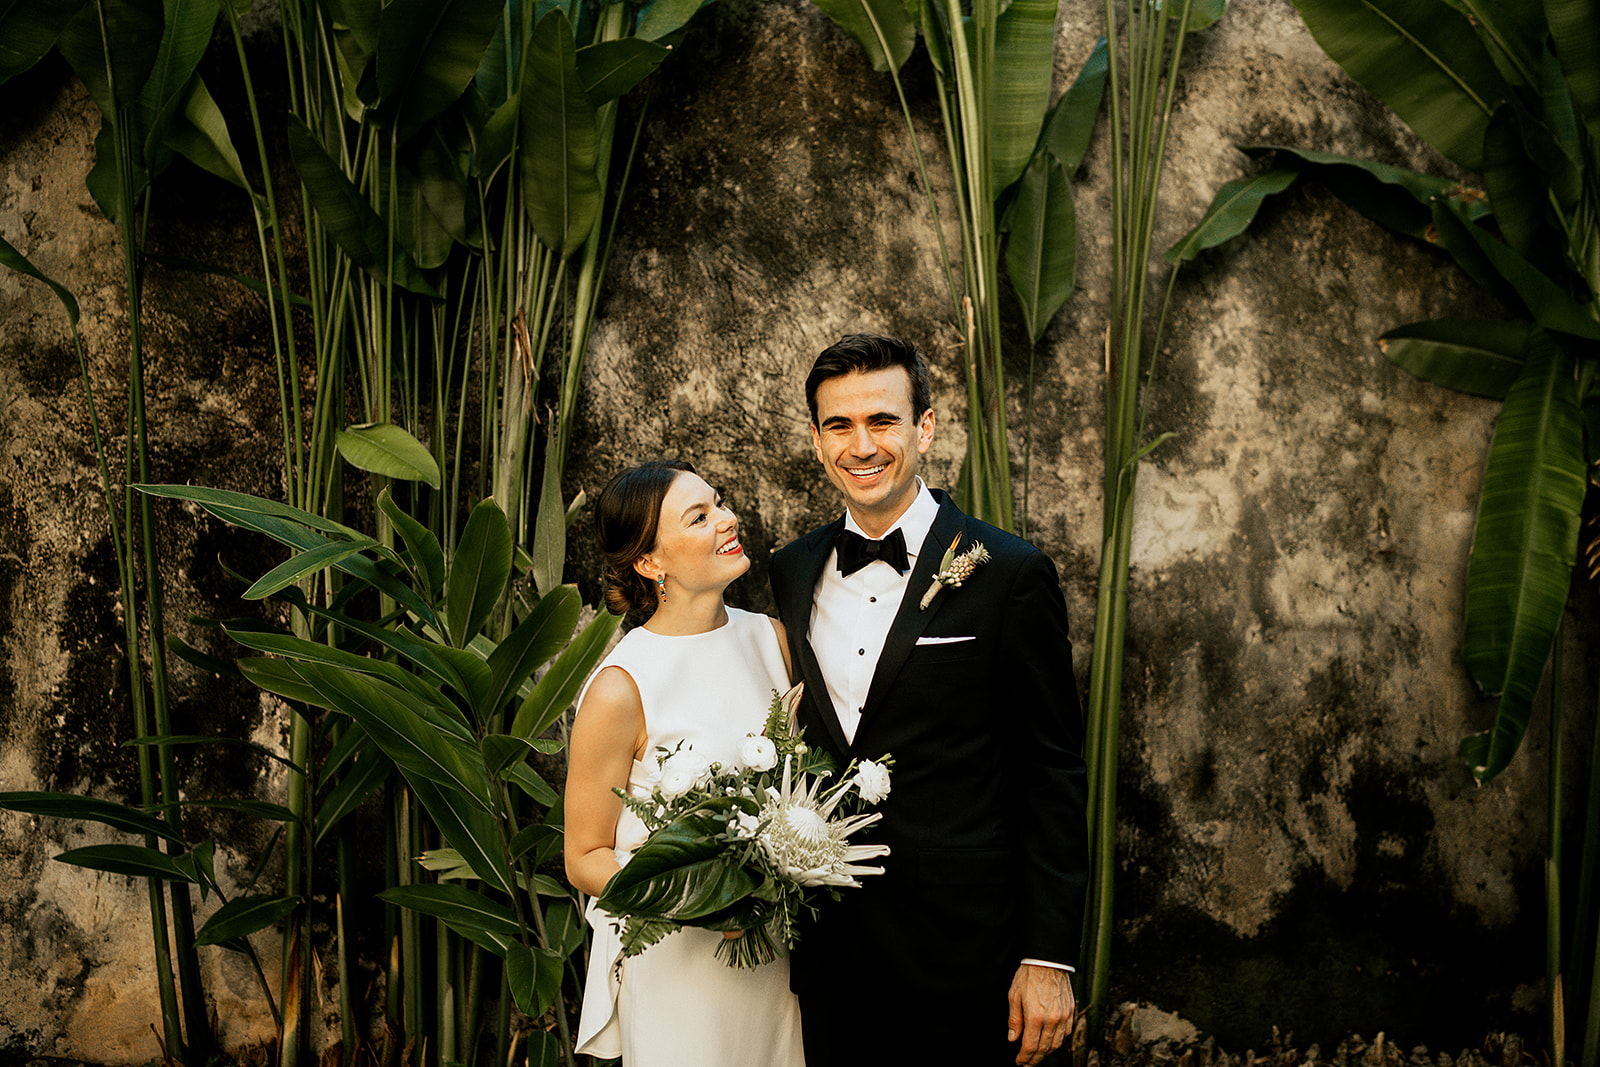 AmandaMarkus-Hacienda-Sac-Chich-Merida-Wedding-298_websize.jpg